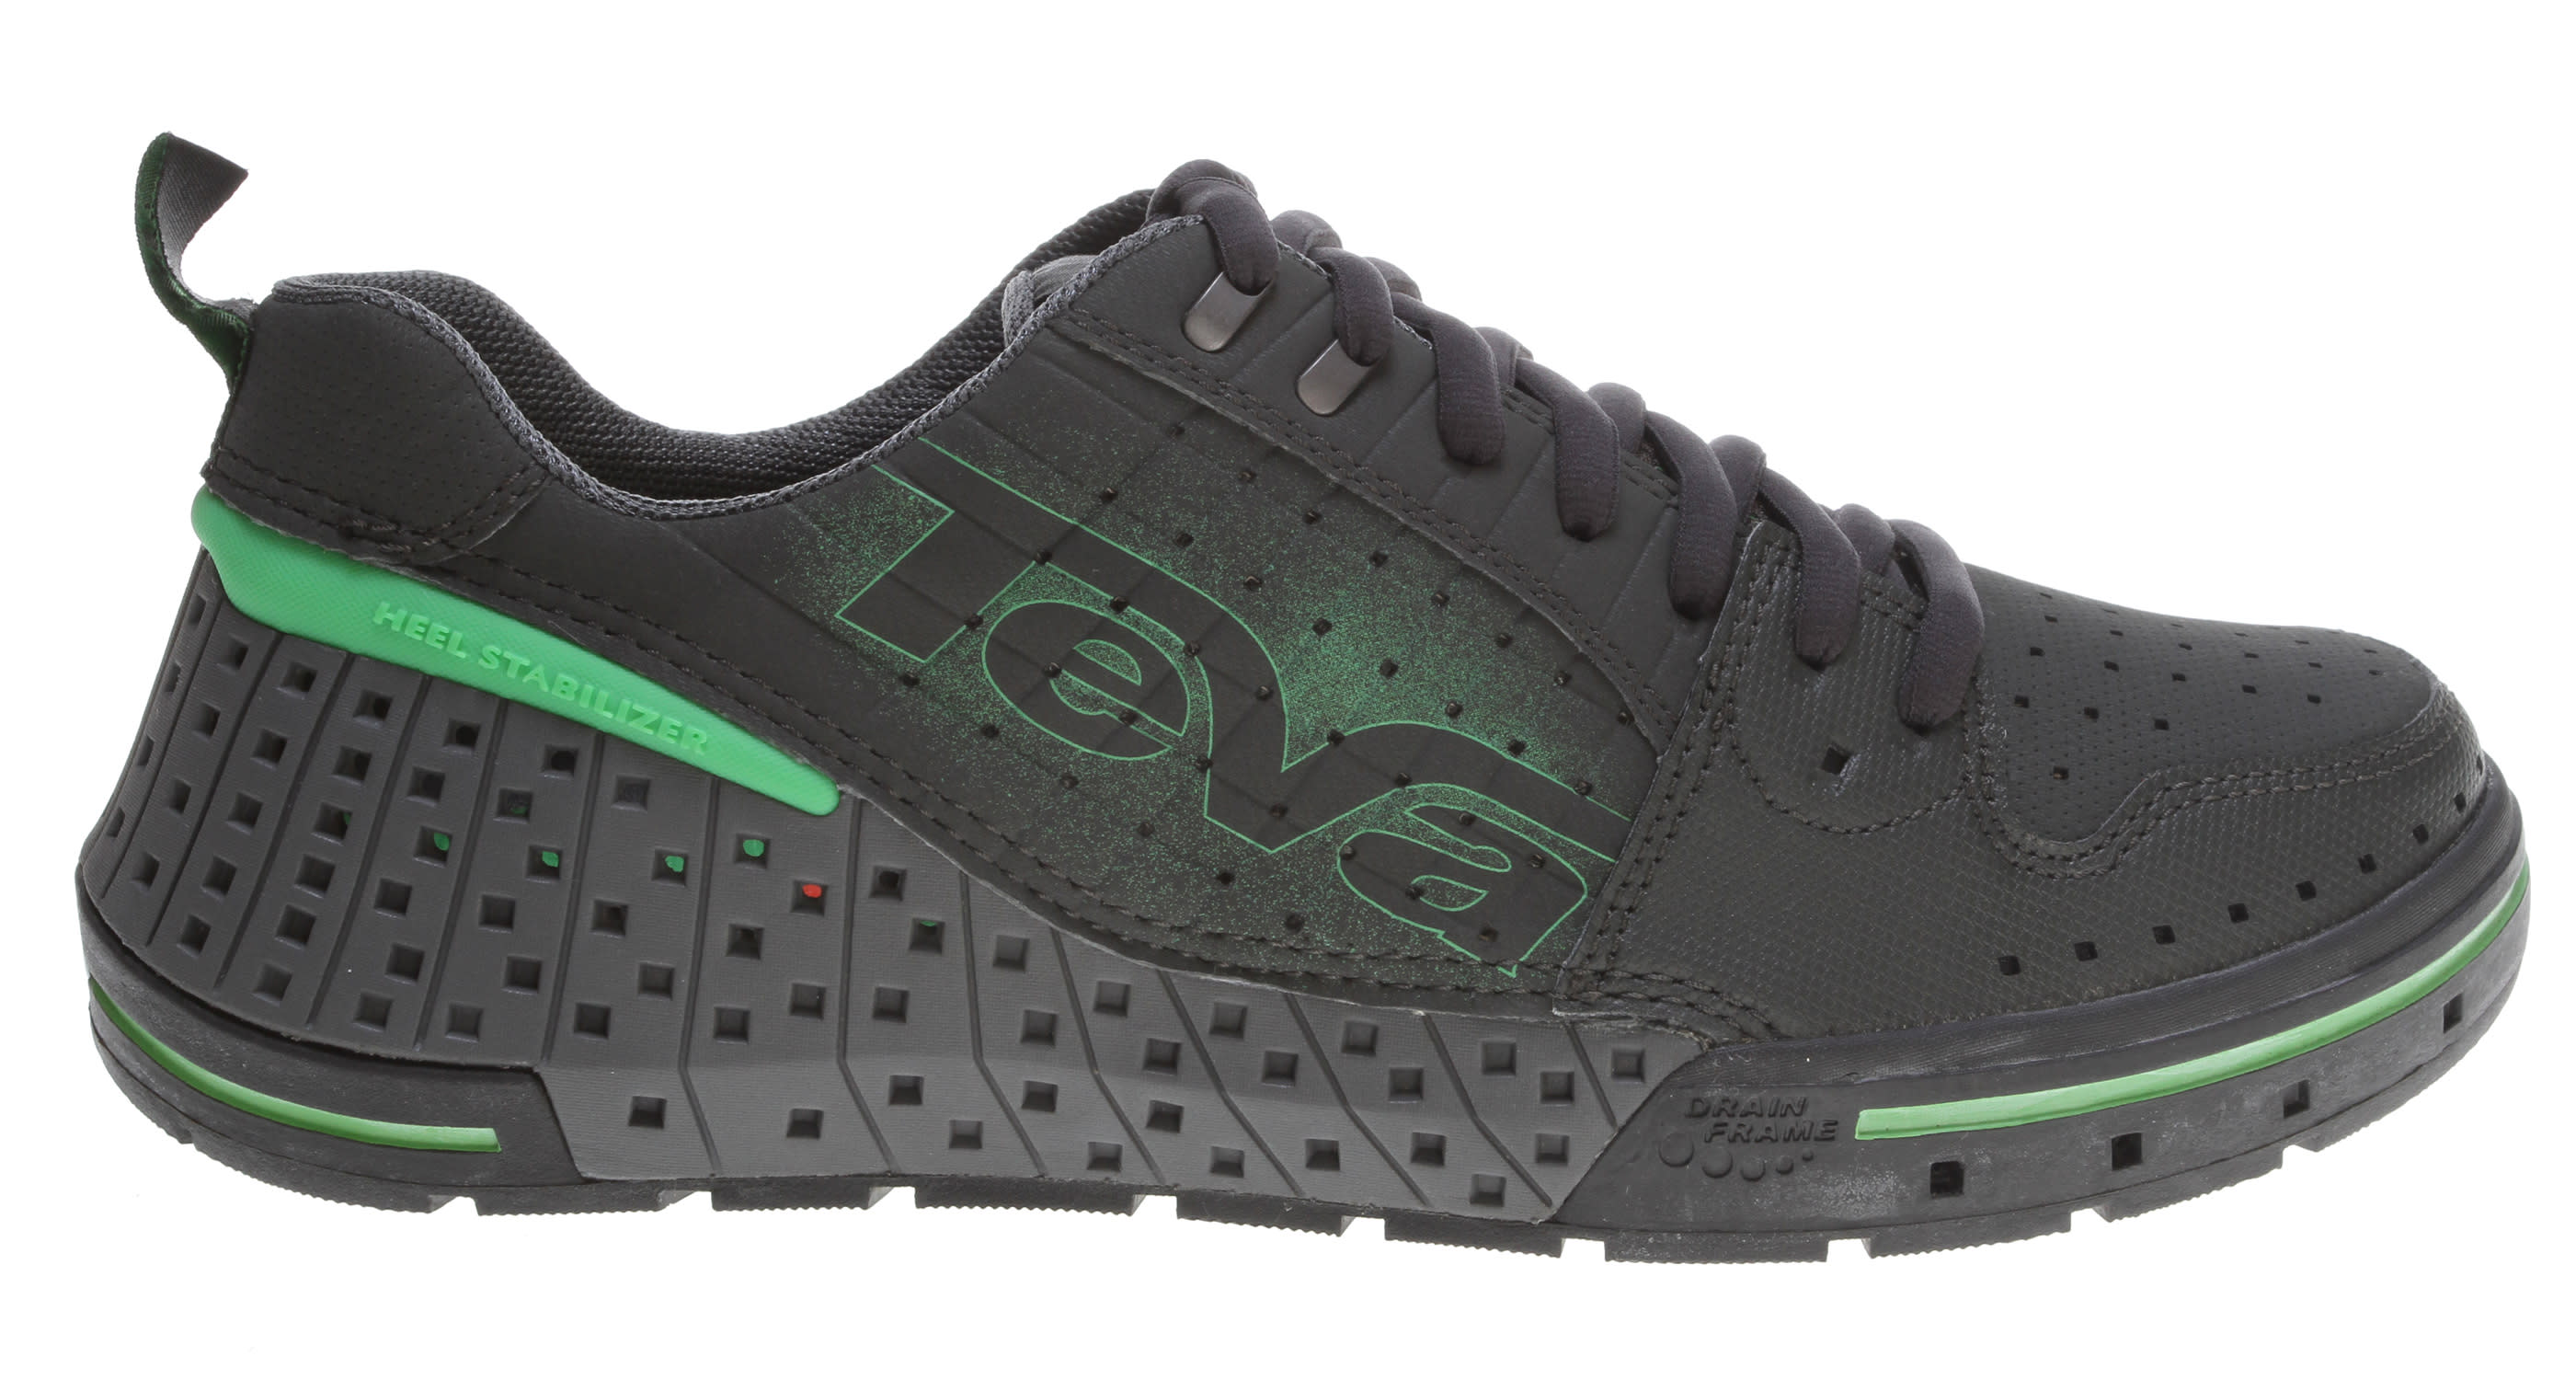 On Sale Teva Gnarkosi Wakeskate Shoes up to 60% off